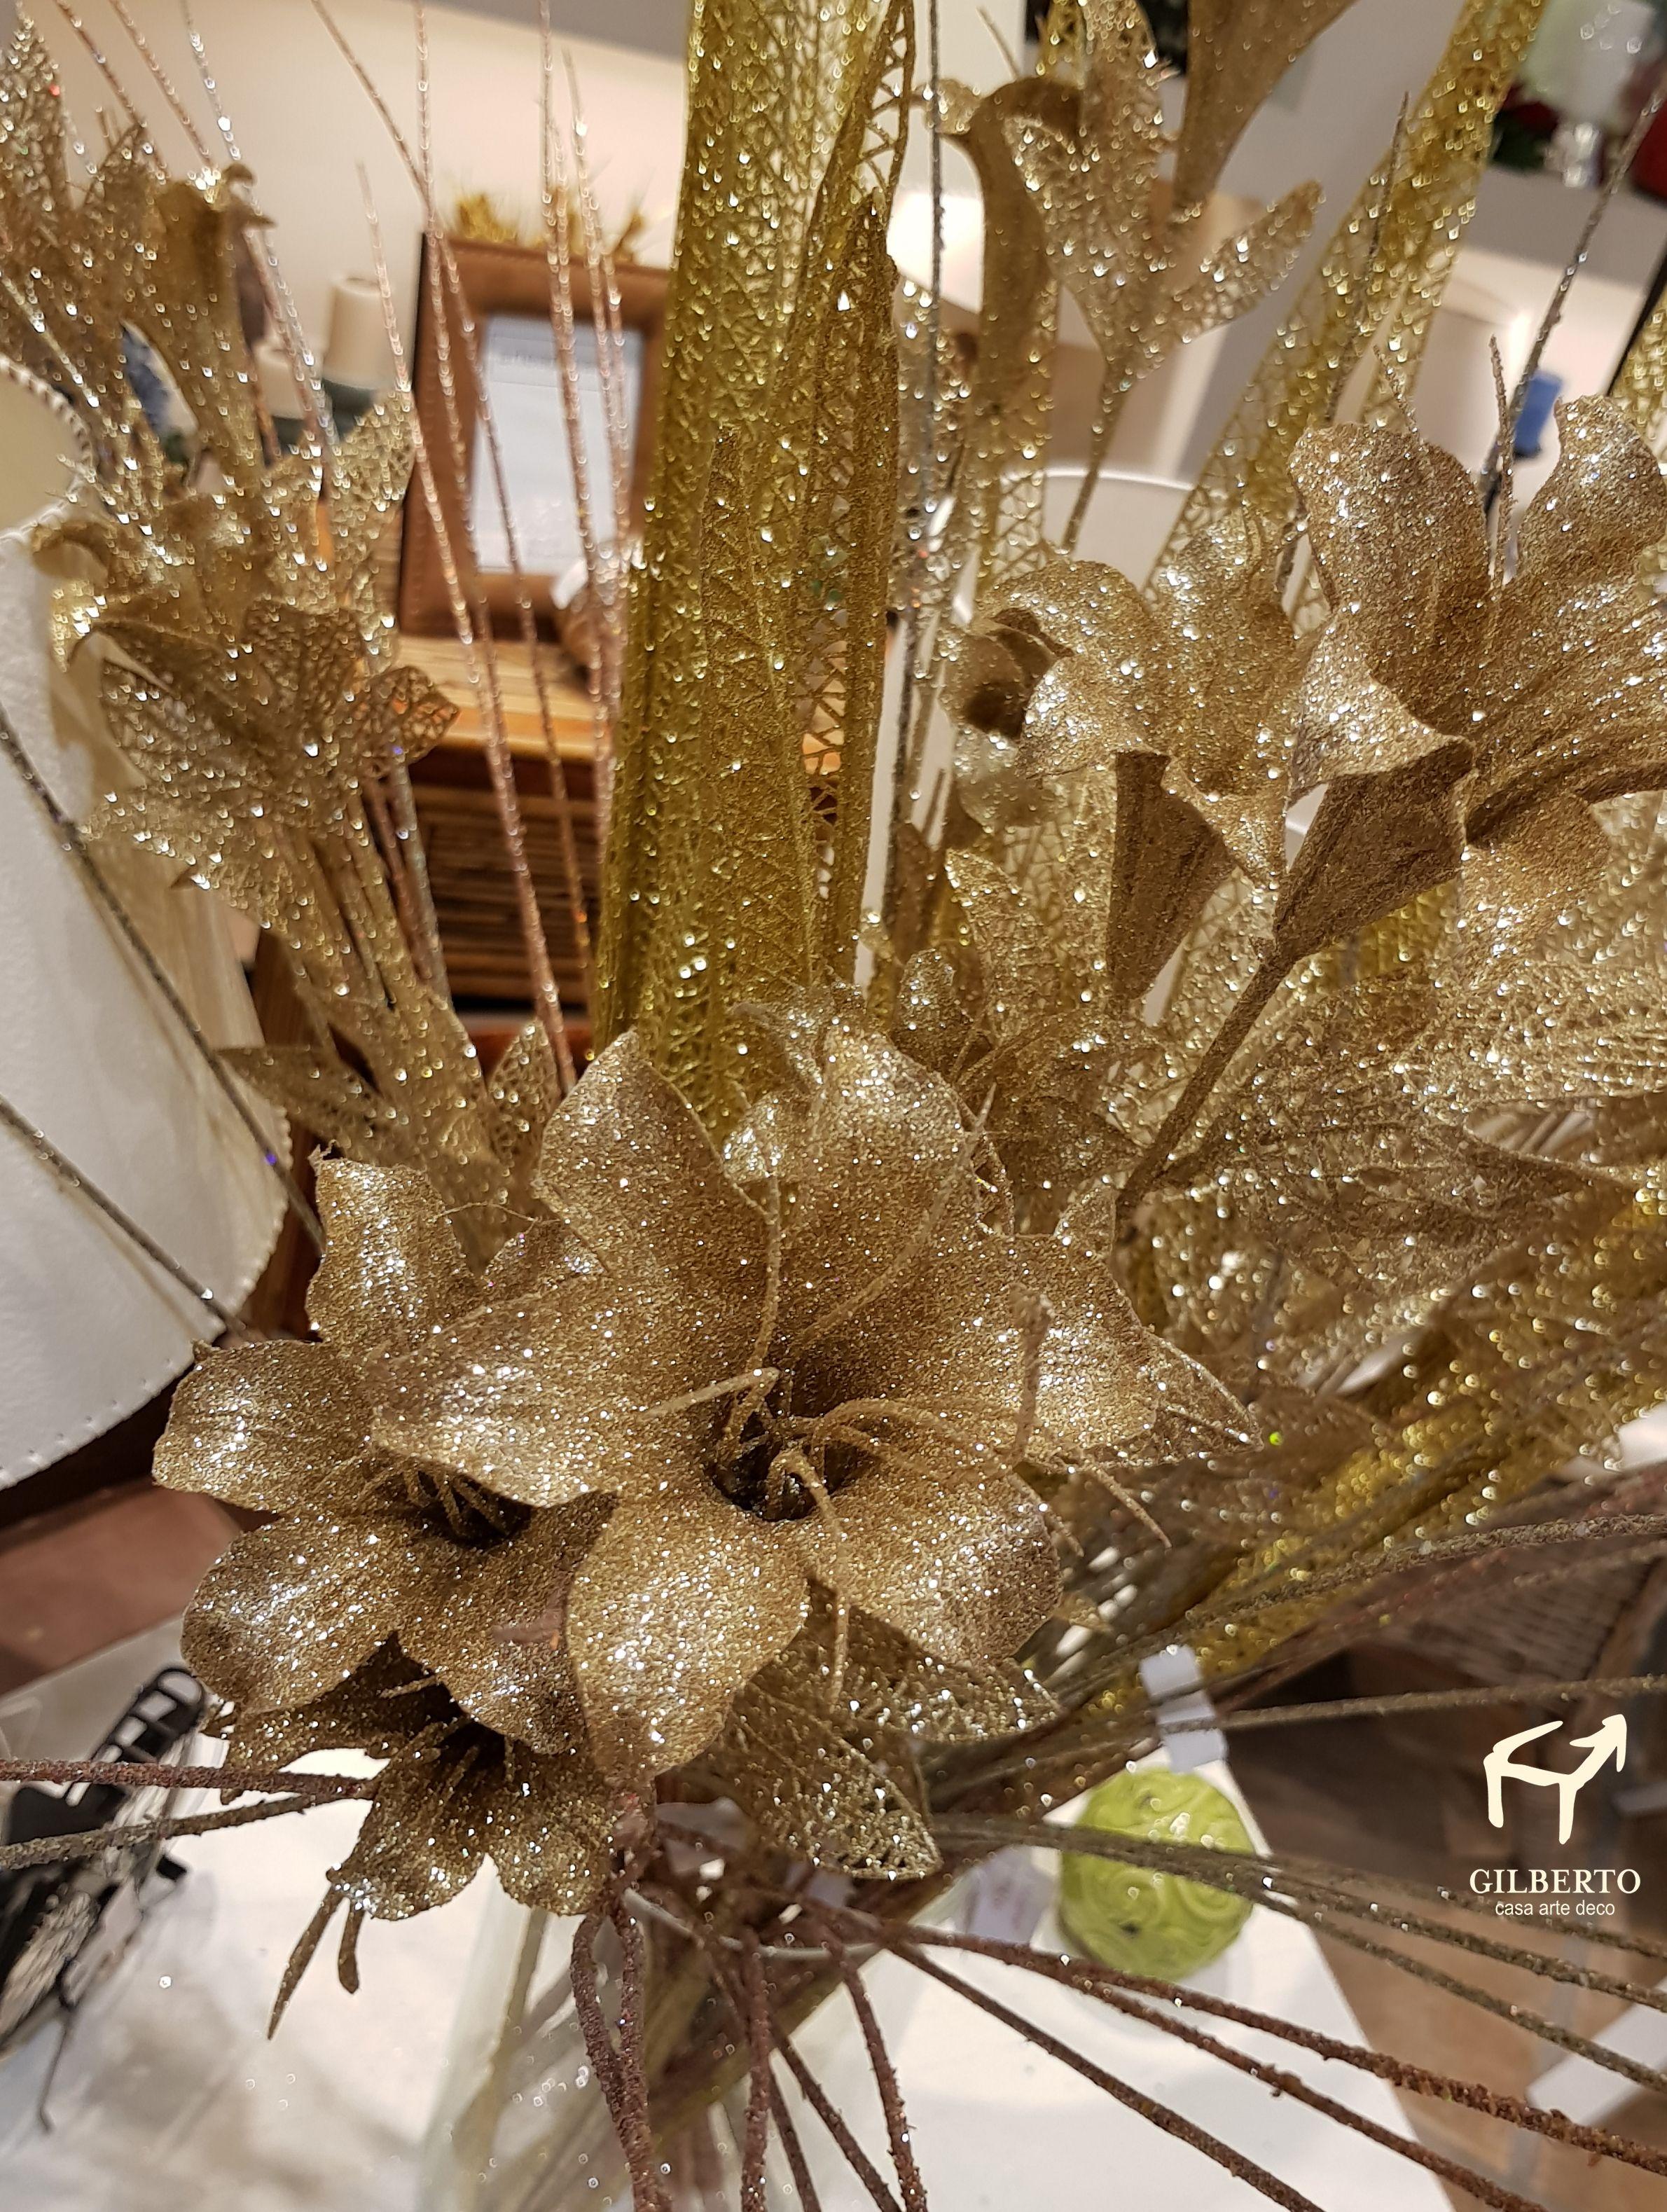 En Gilberto Casa Arte Deco - Salta tenemos de todo para decorar tu ...